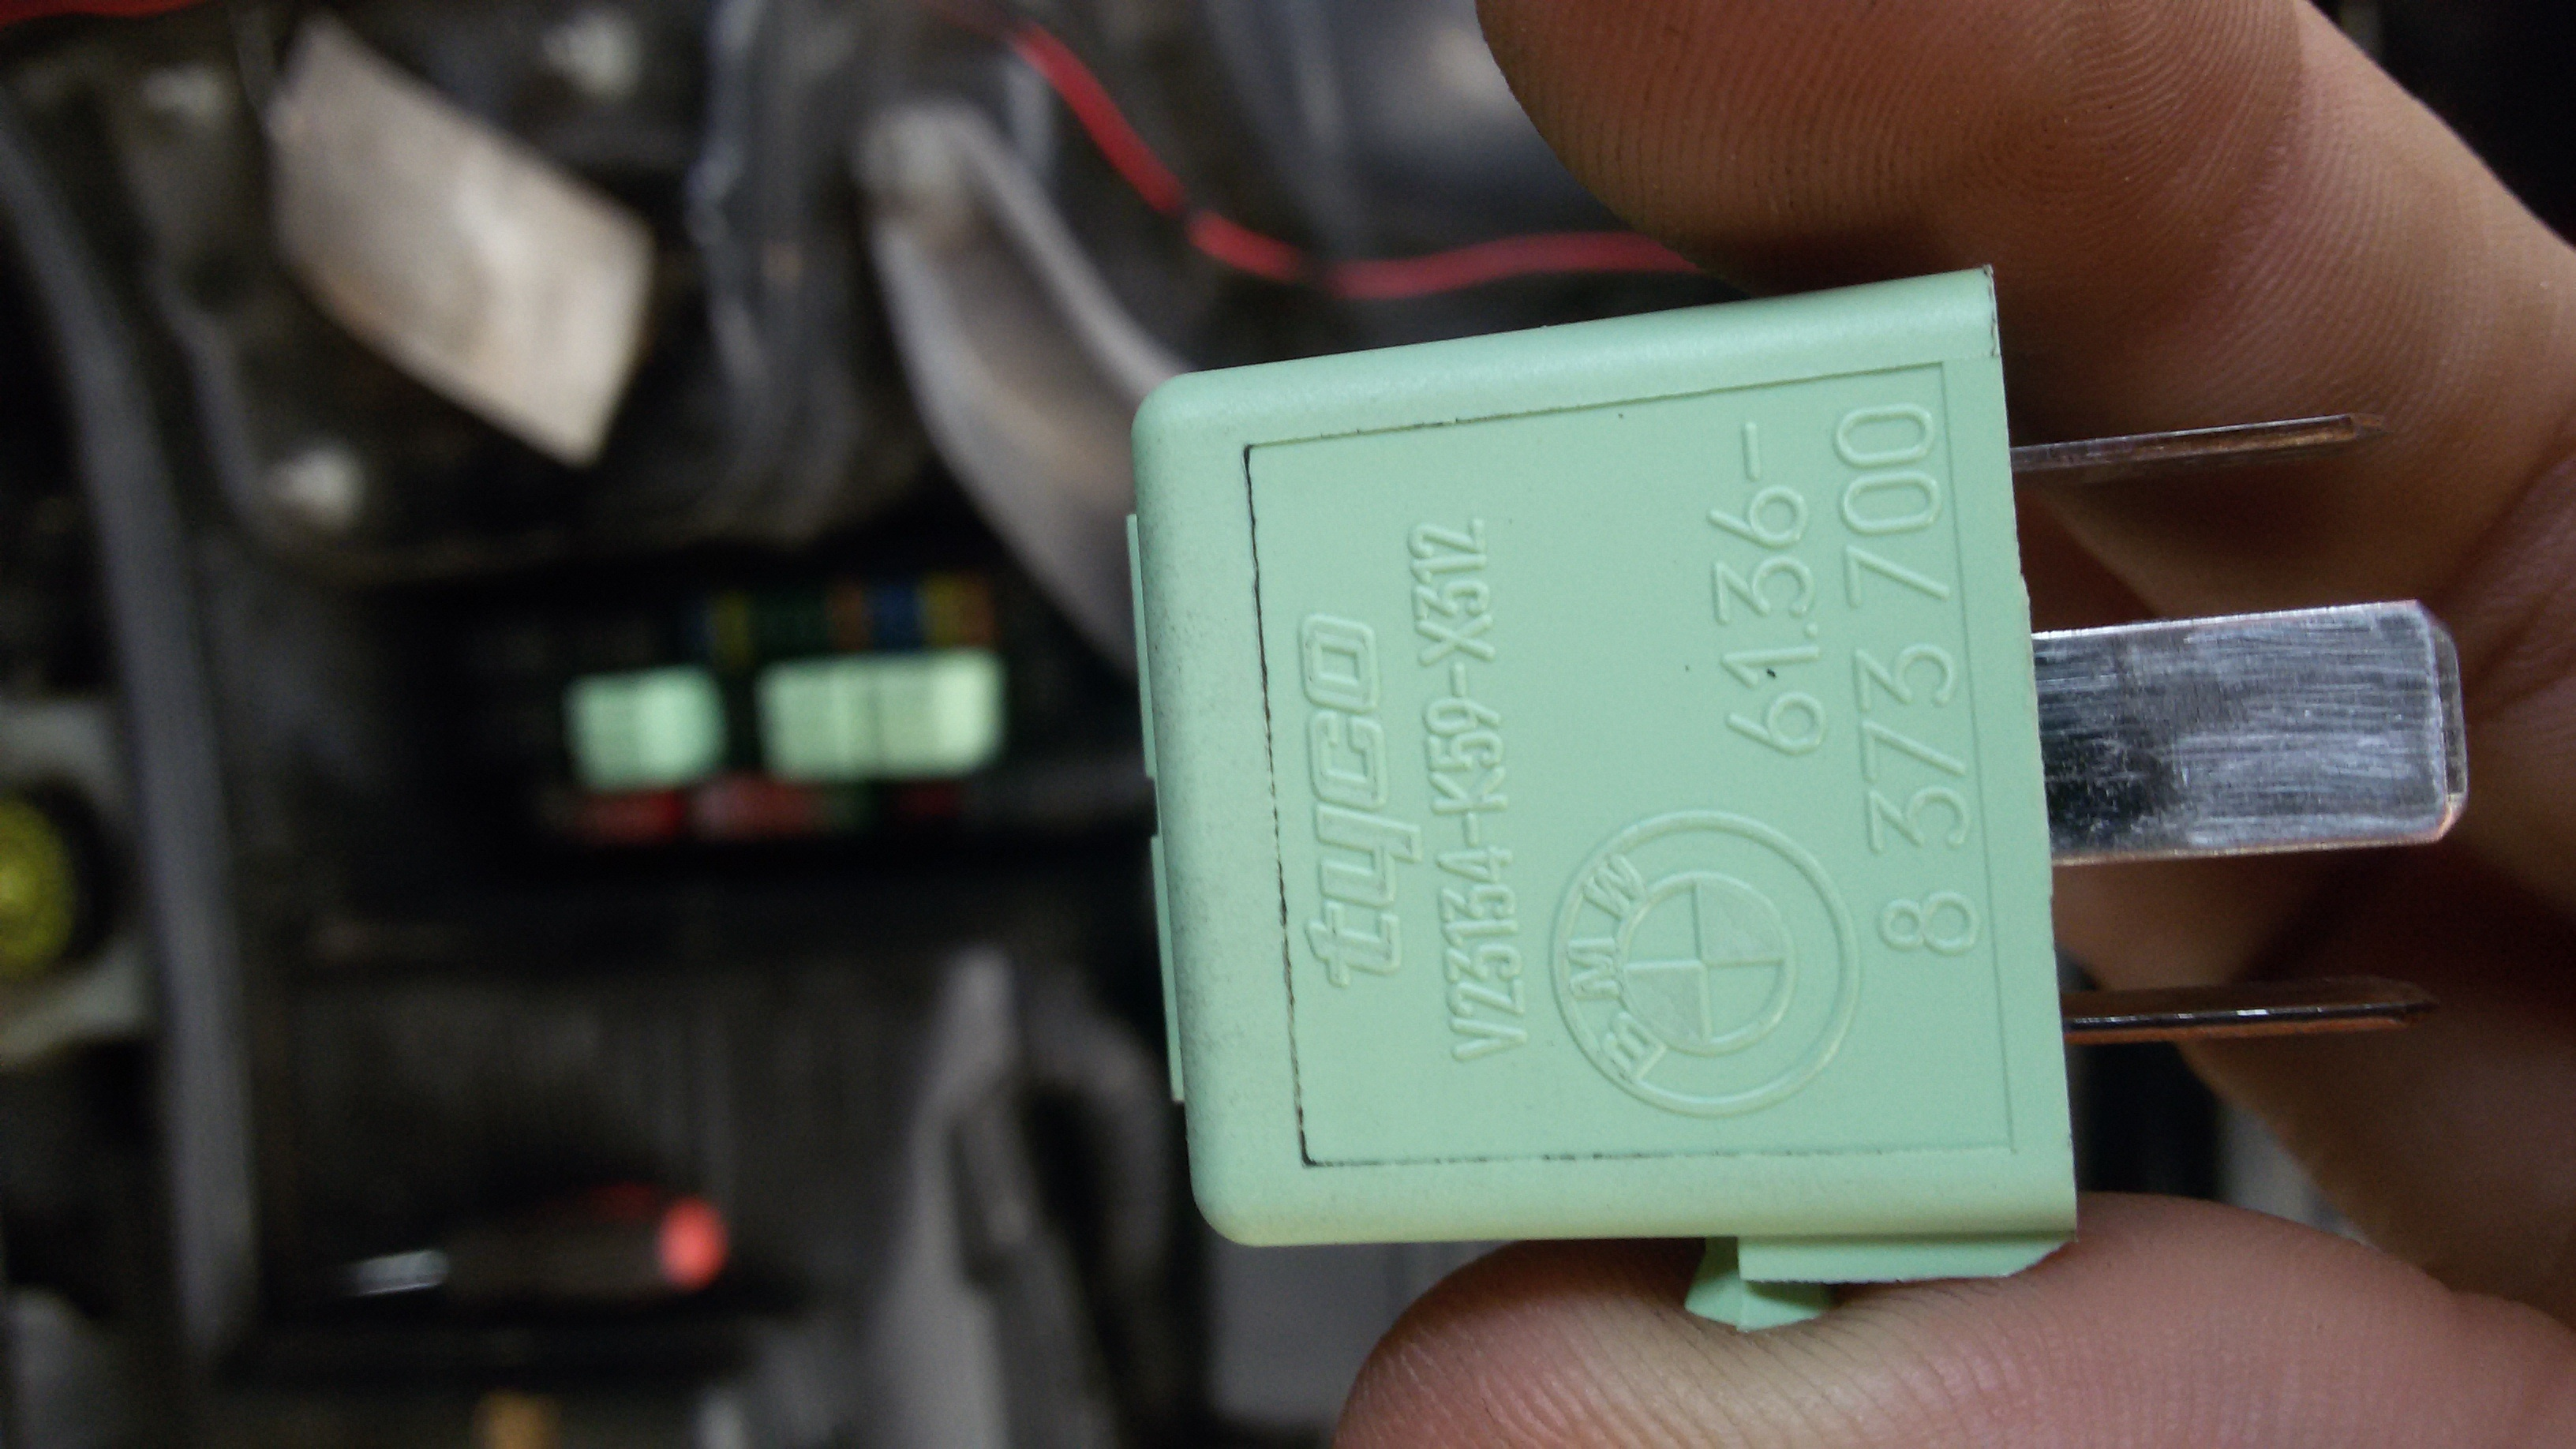 Mini r50 Lüfter daheim testen auf Funktion - MINI² - Die ComMINIty ...